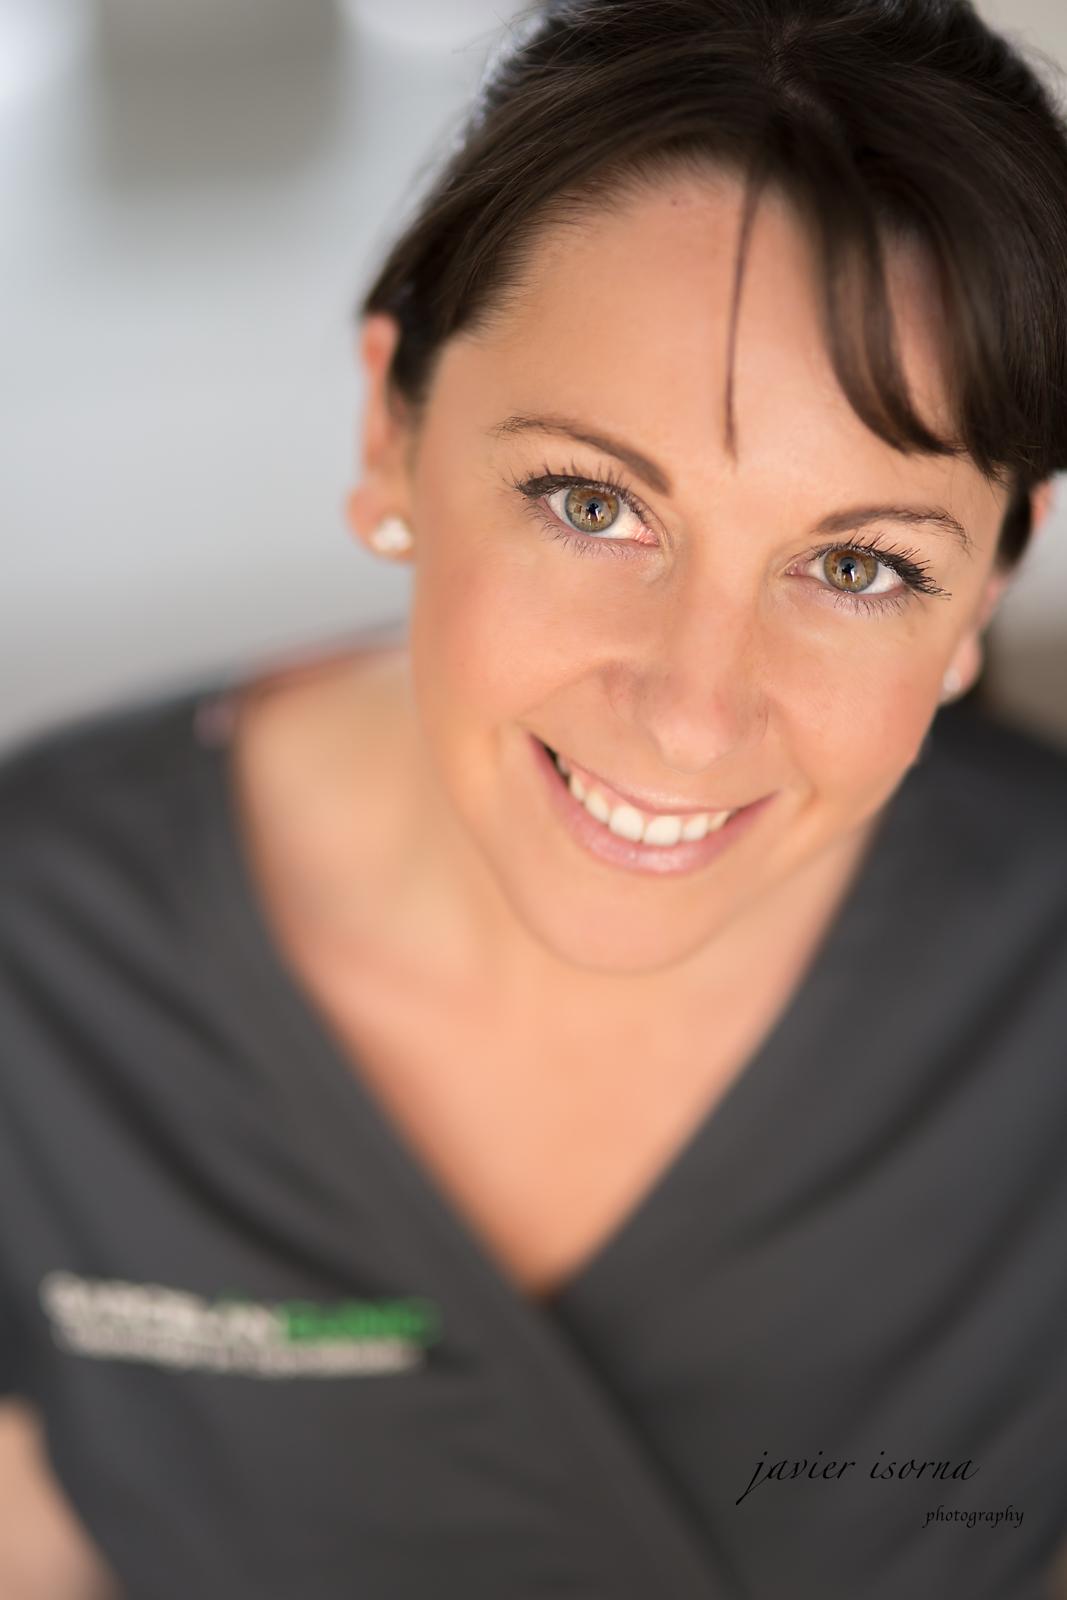 Dra. Ana Orozco Varo, prótesis sevilla, carillas en Sevilla, fundas dentales en Sevilla, diseño de sonrisa en Sevilla